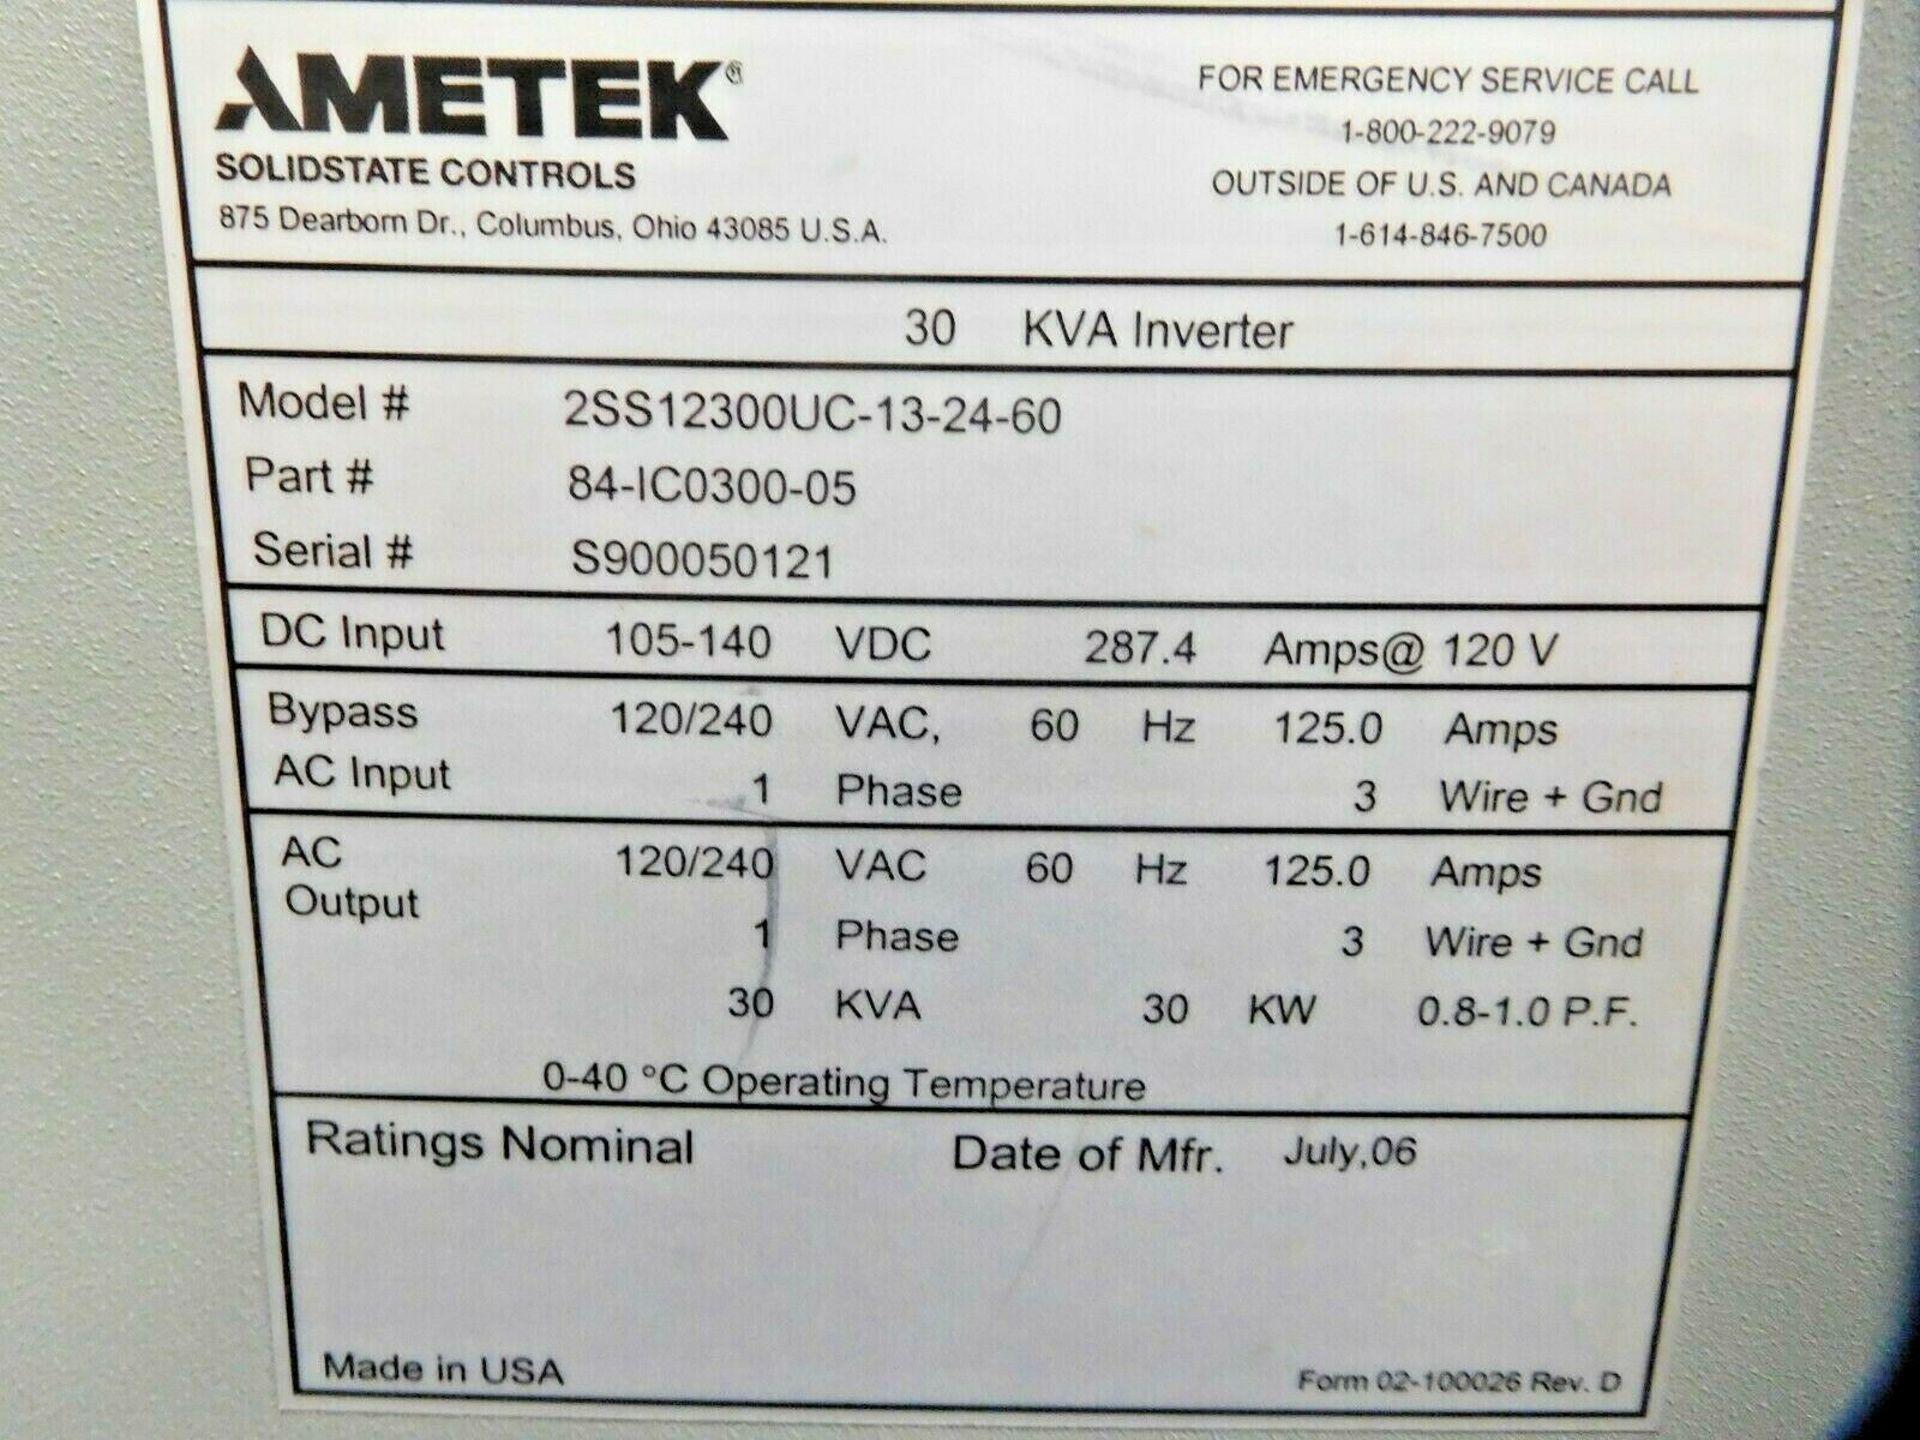 Ametek Solid State Controls 30 KVA Power Inverter. 1 Ph. - Image 2 of 2